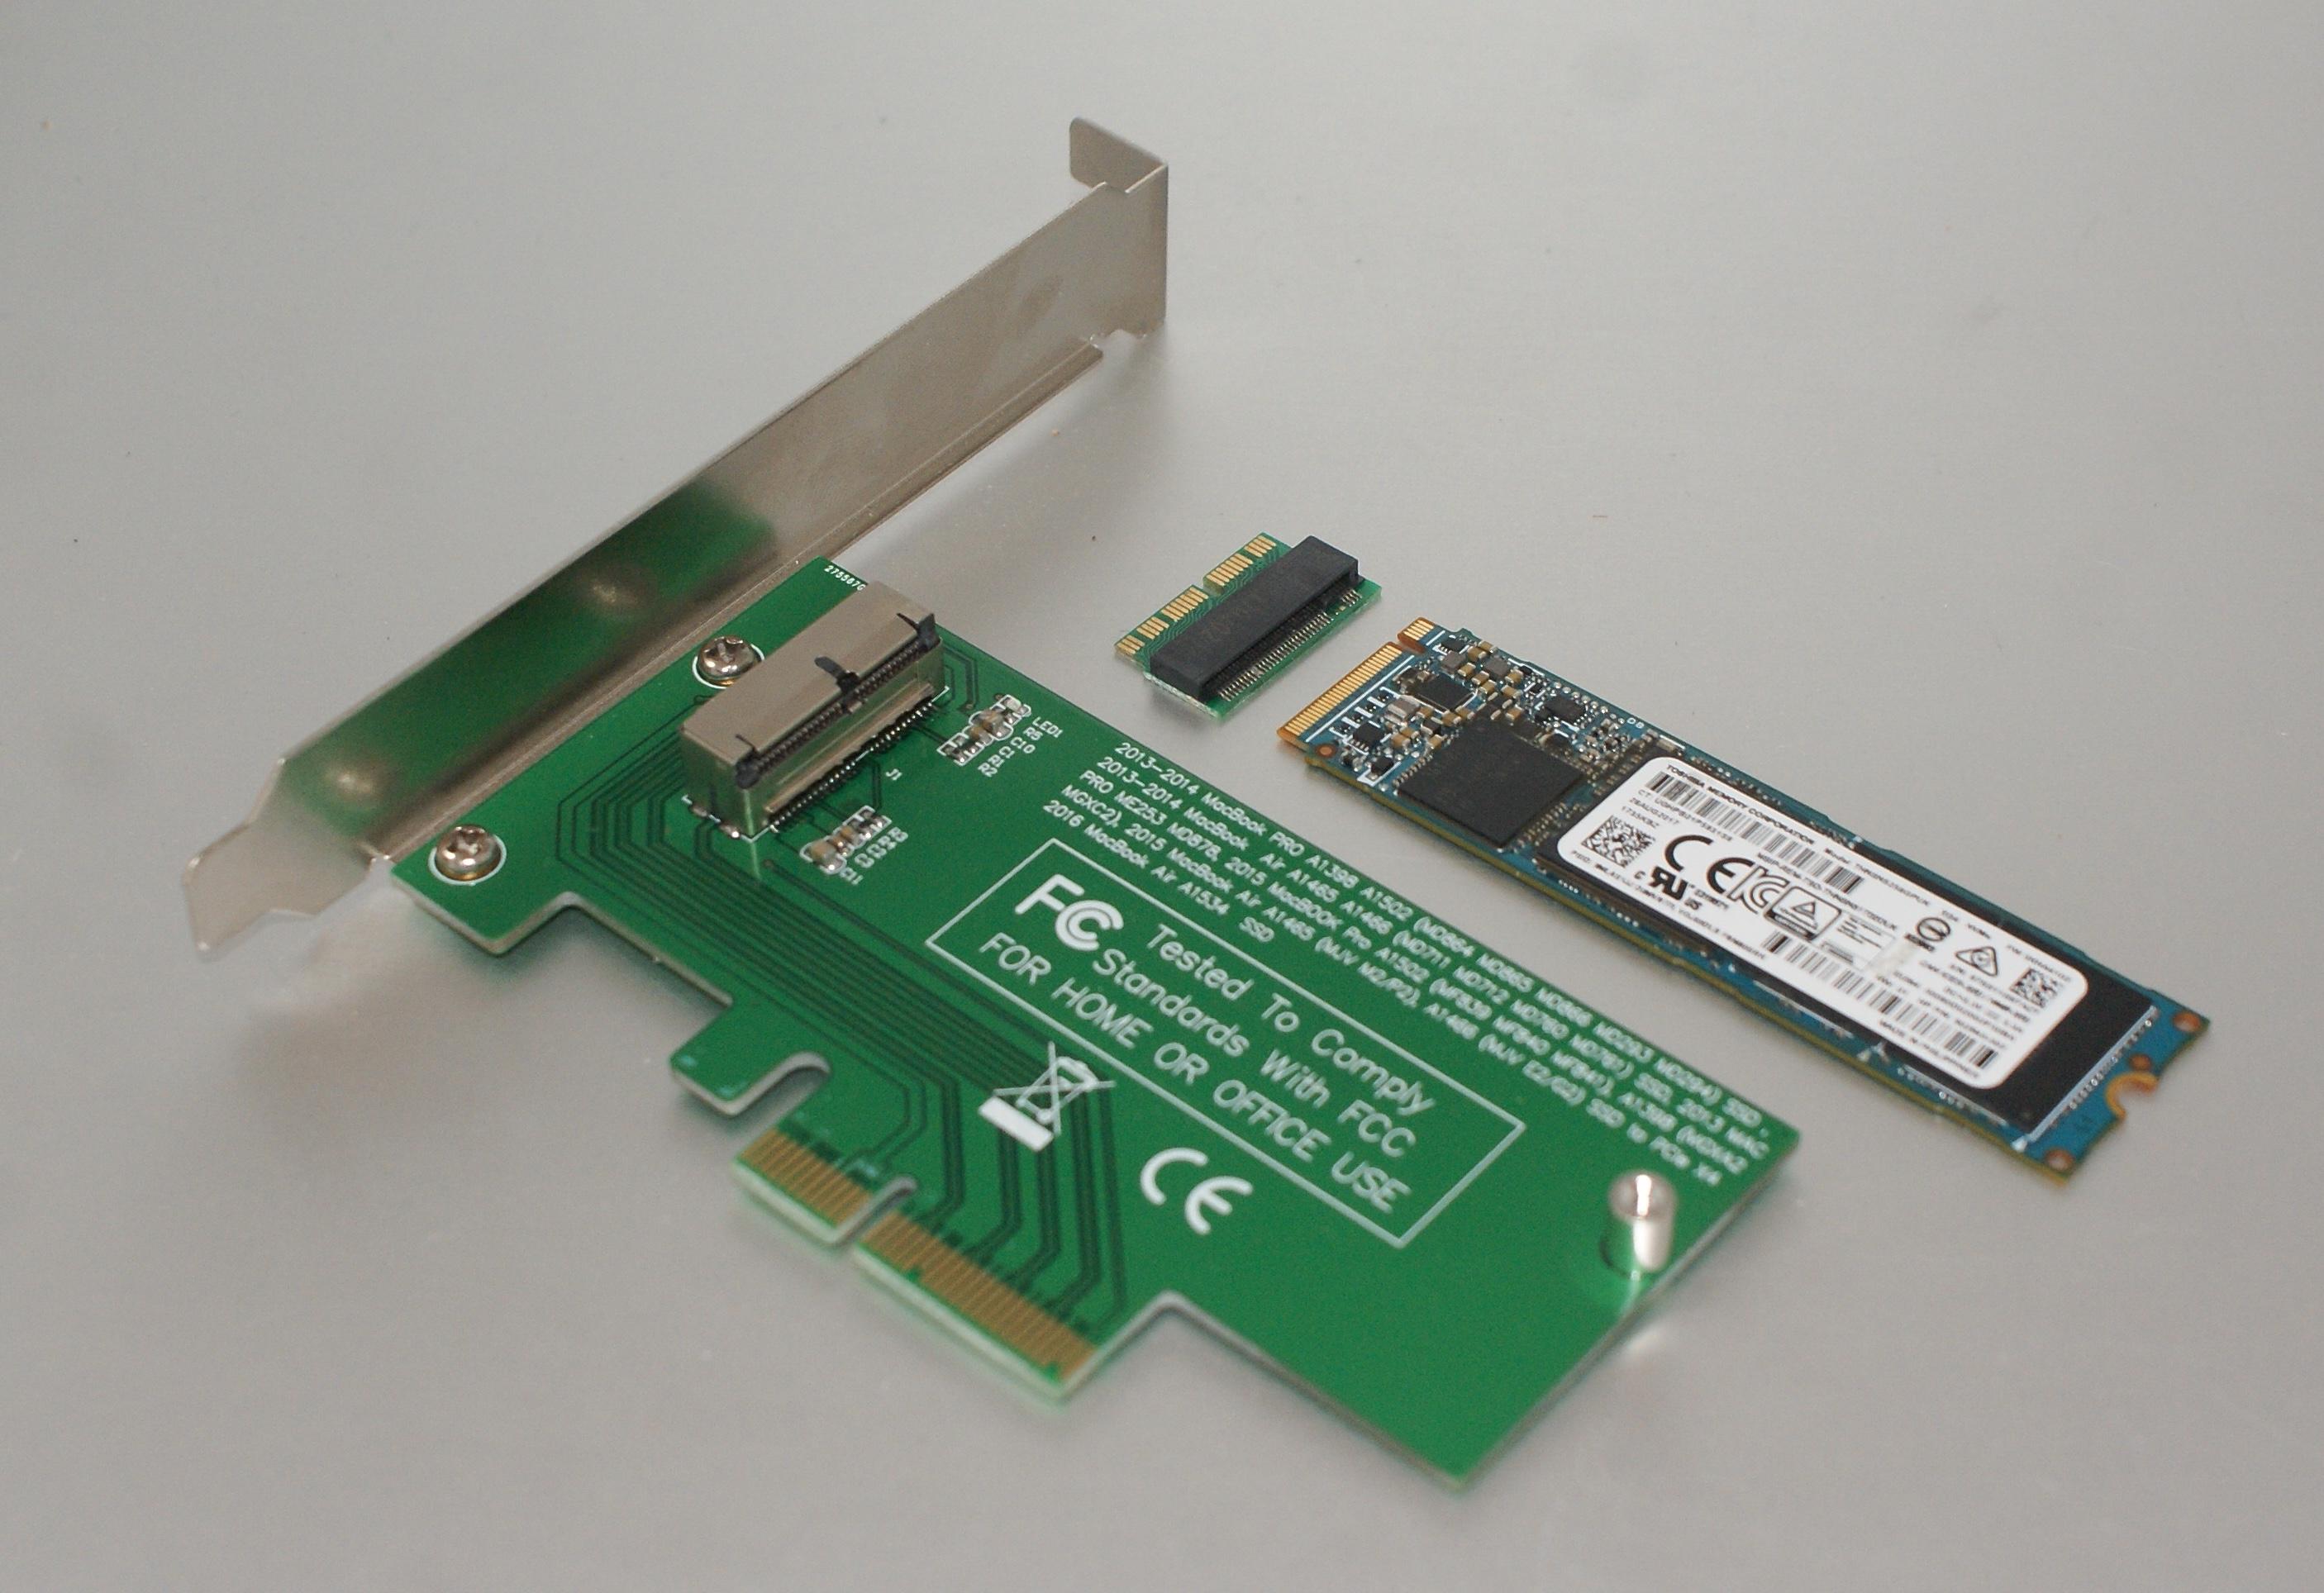 SSD MACBOOK 2013 2014 2015 2016 2017 2018 M.2 NGFF Adapter M2 NVME AHCI